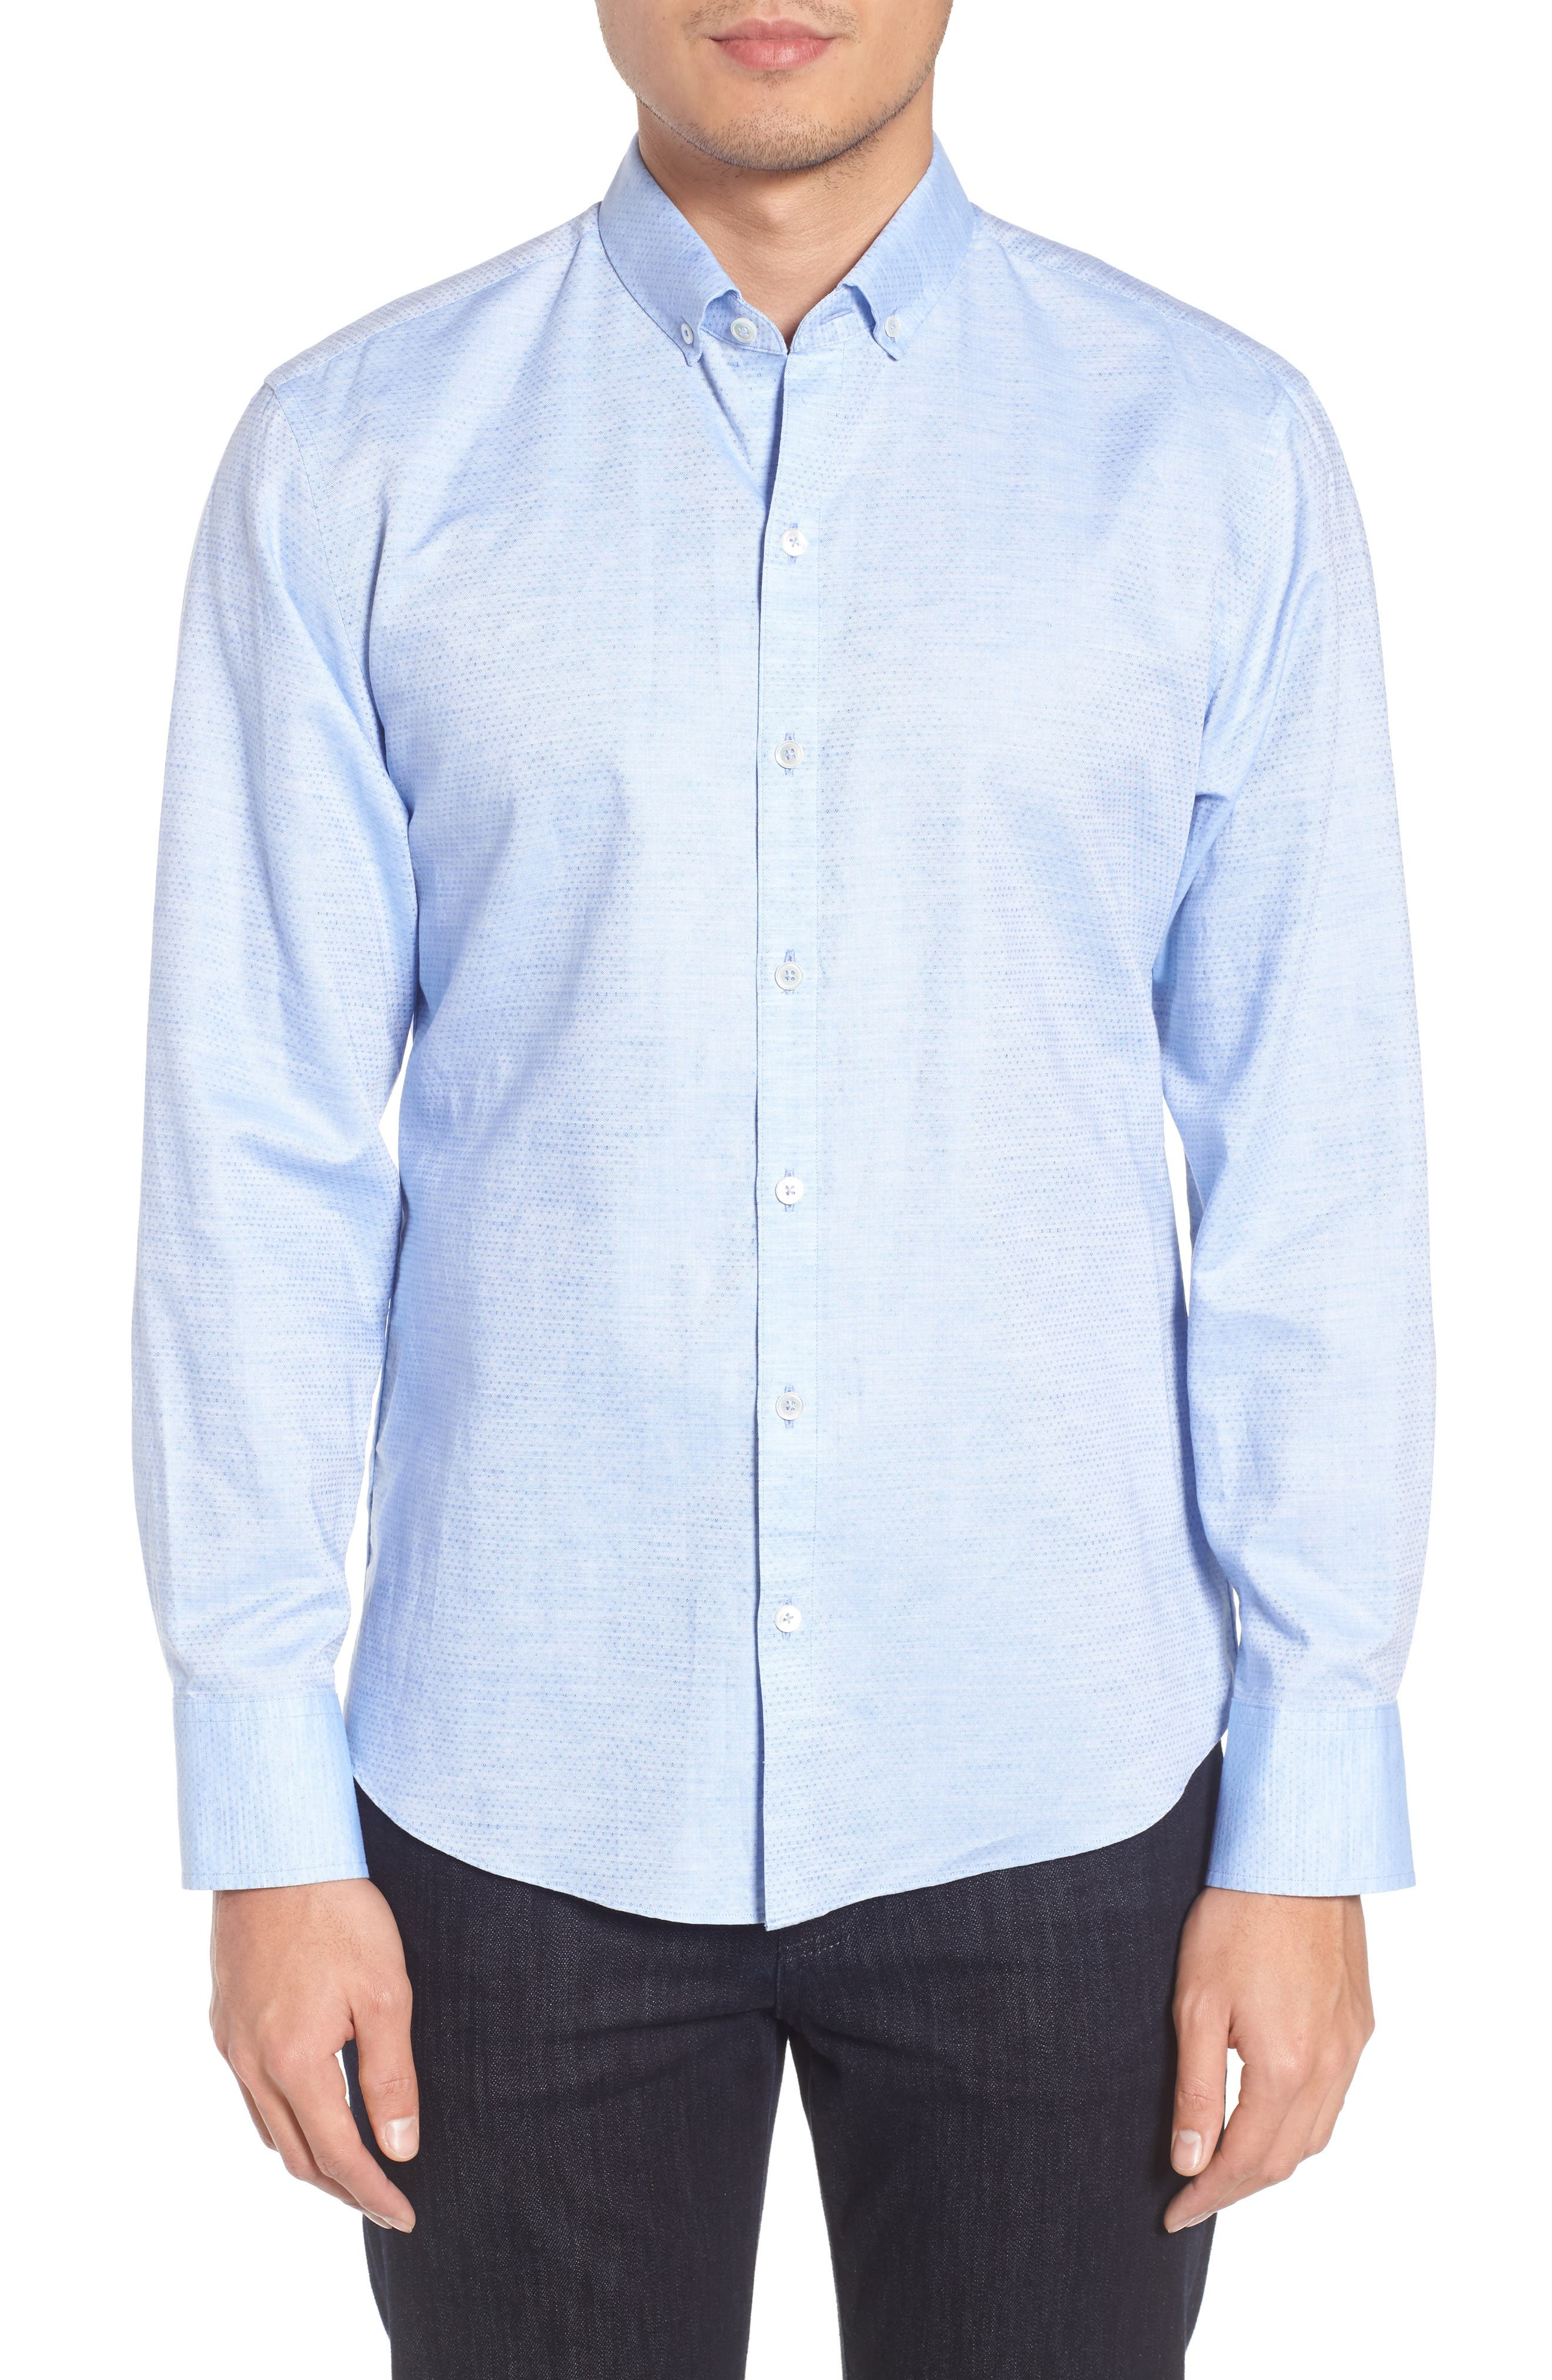 Gomis Regular Fit Dobby Sport Shirt,                             Main thumbnail 1, color,                             Light Blue